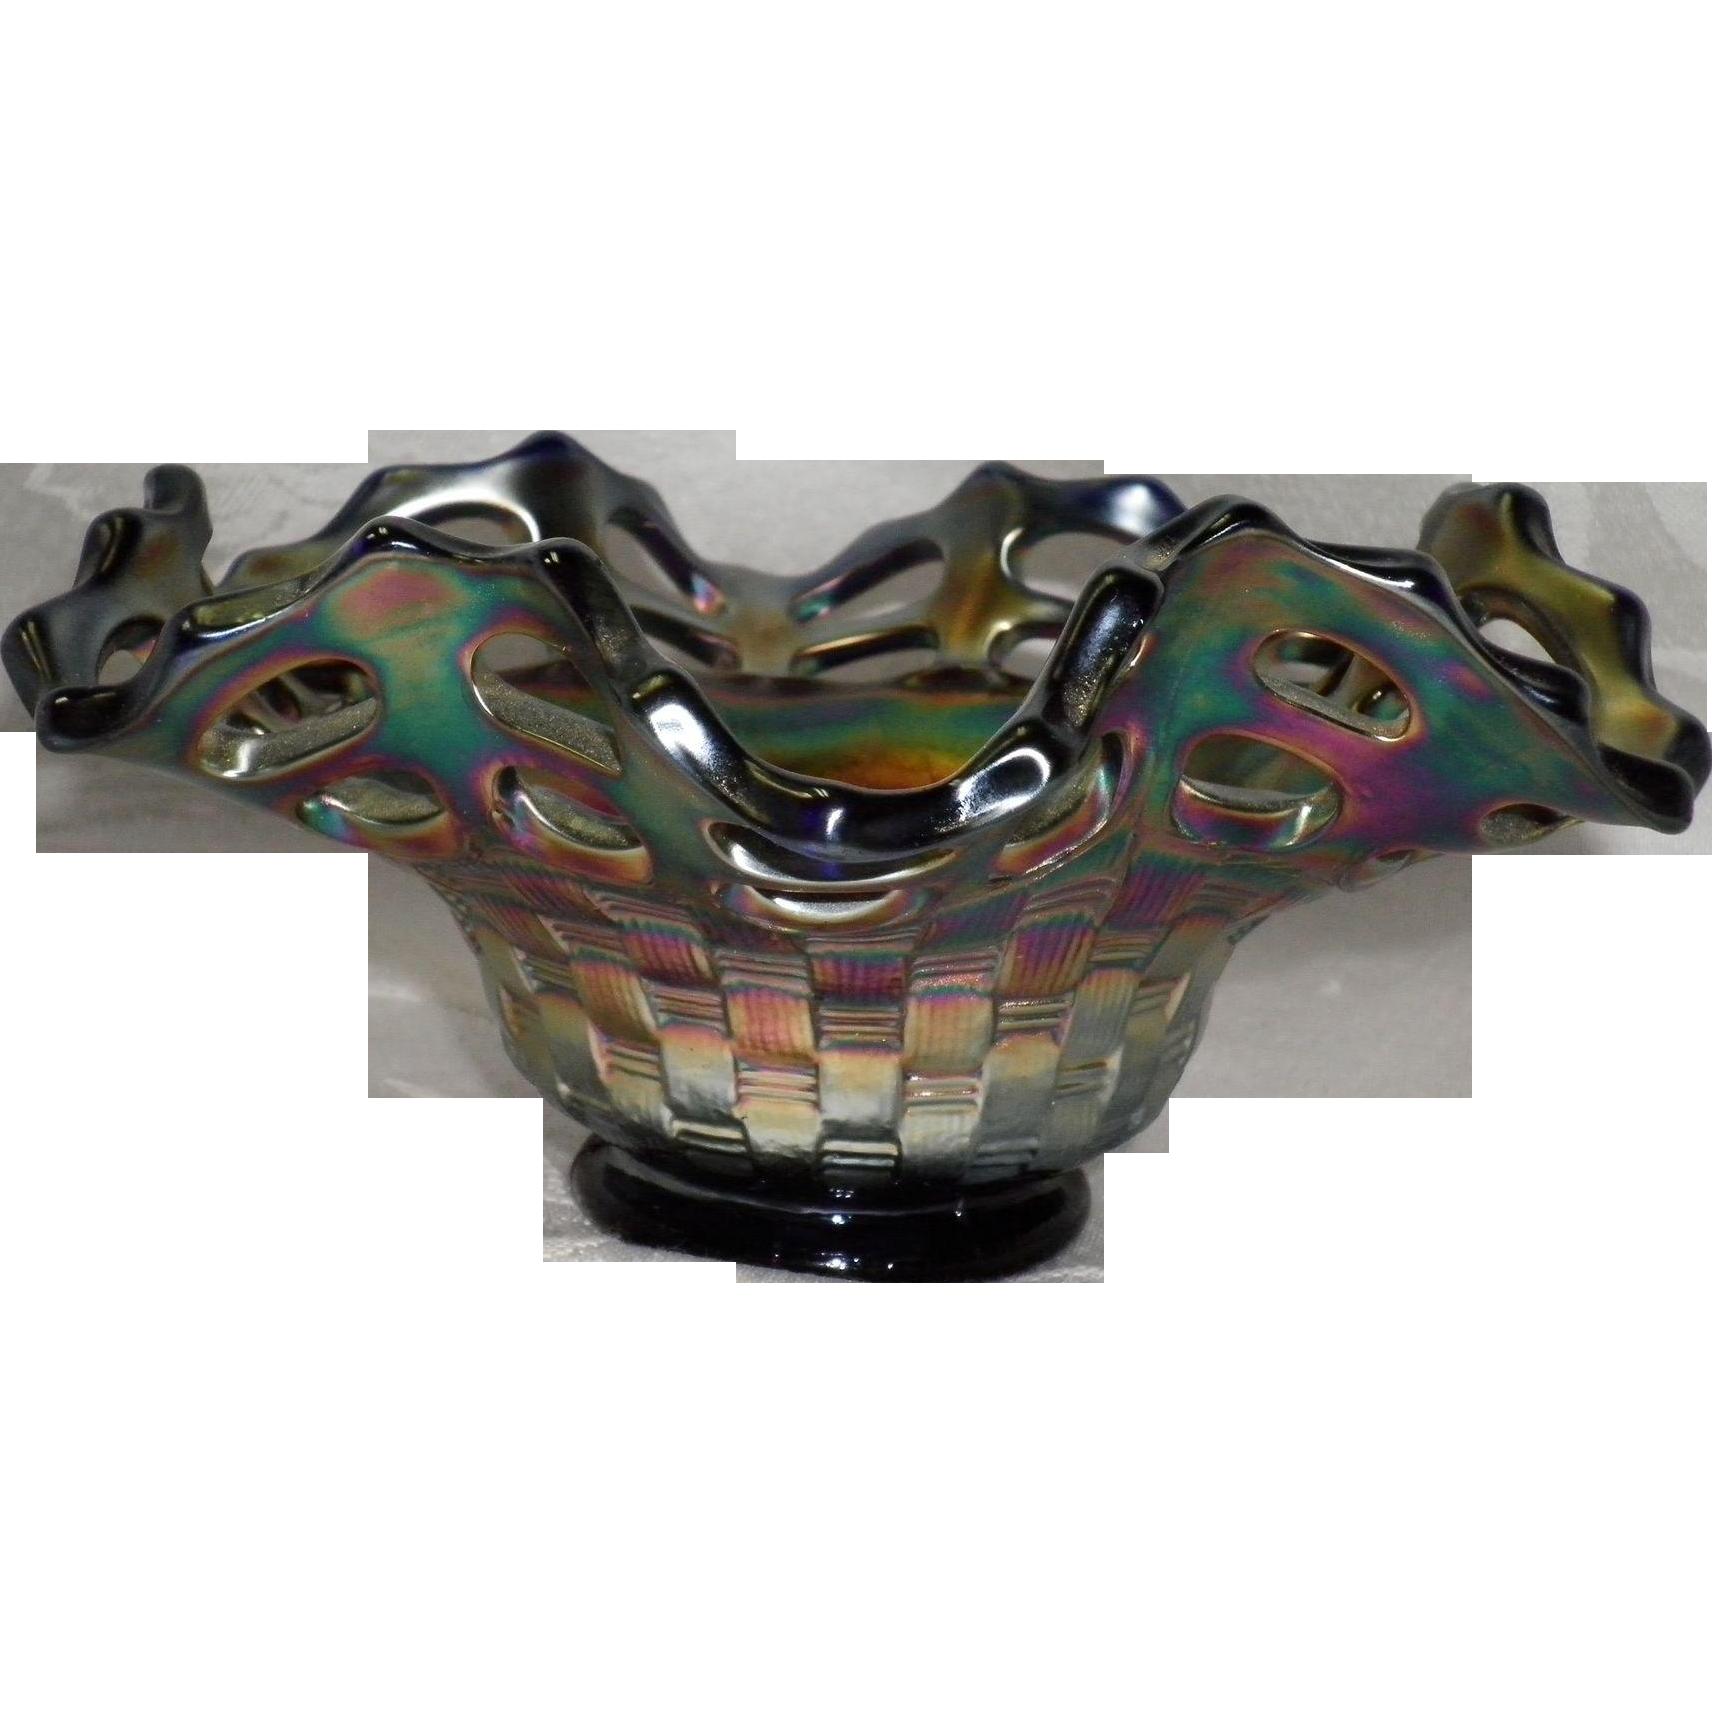 Fenton Cobalt Blue Carnival Iridescent  Glass Basket Weave Dish / Bowl